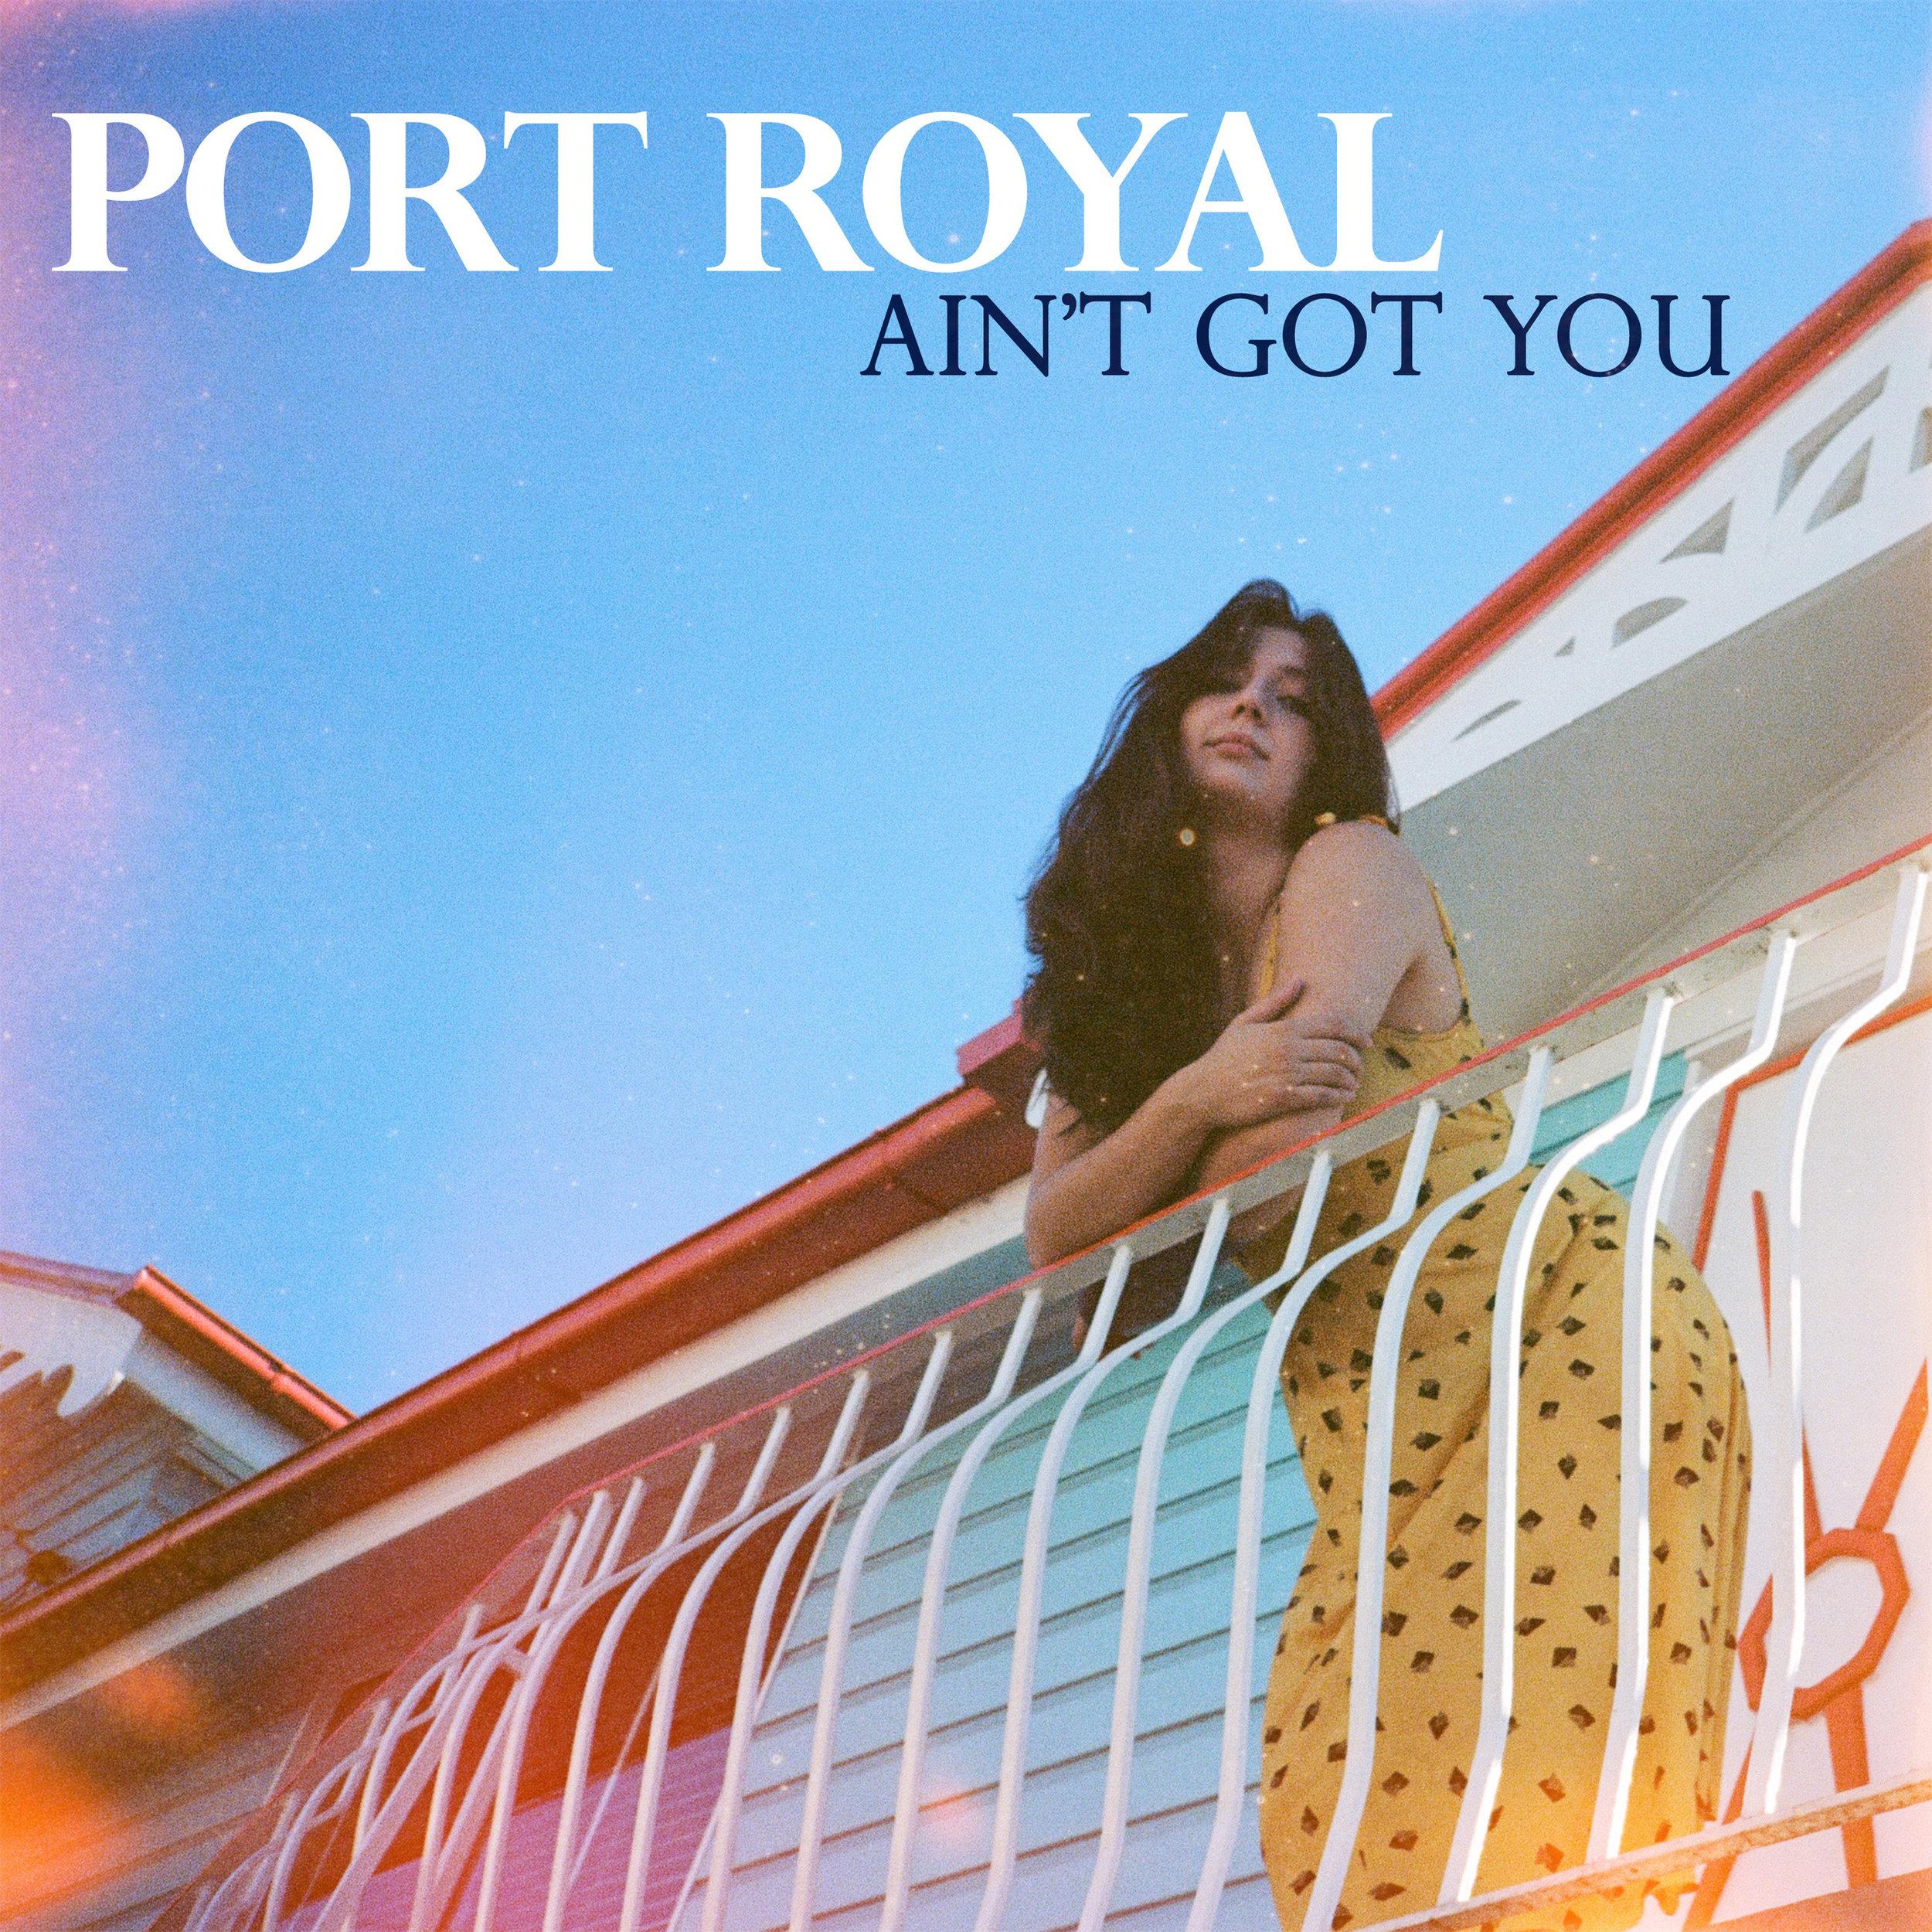 Port Royal - Ain't Got You Single Cover.jpg